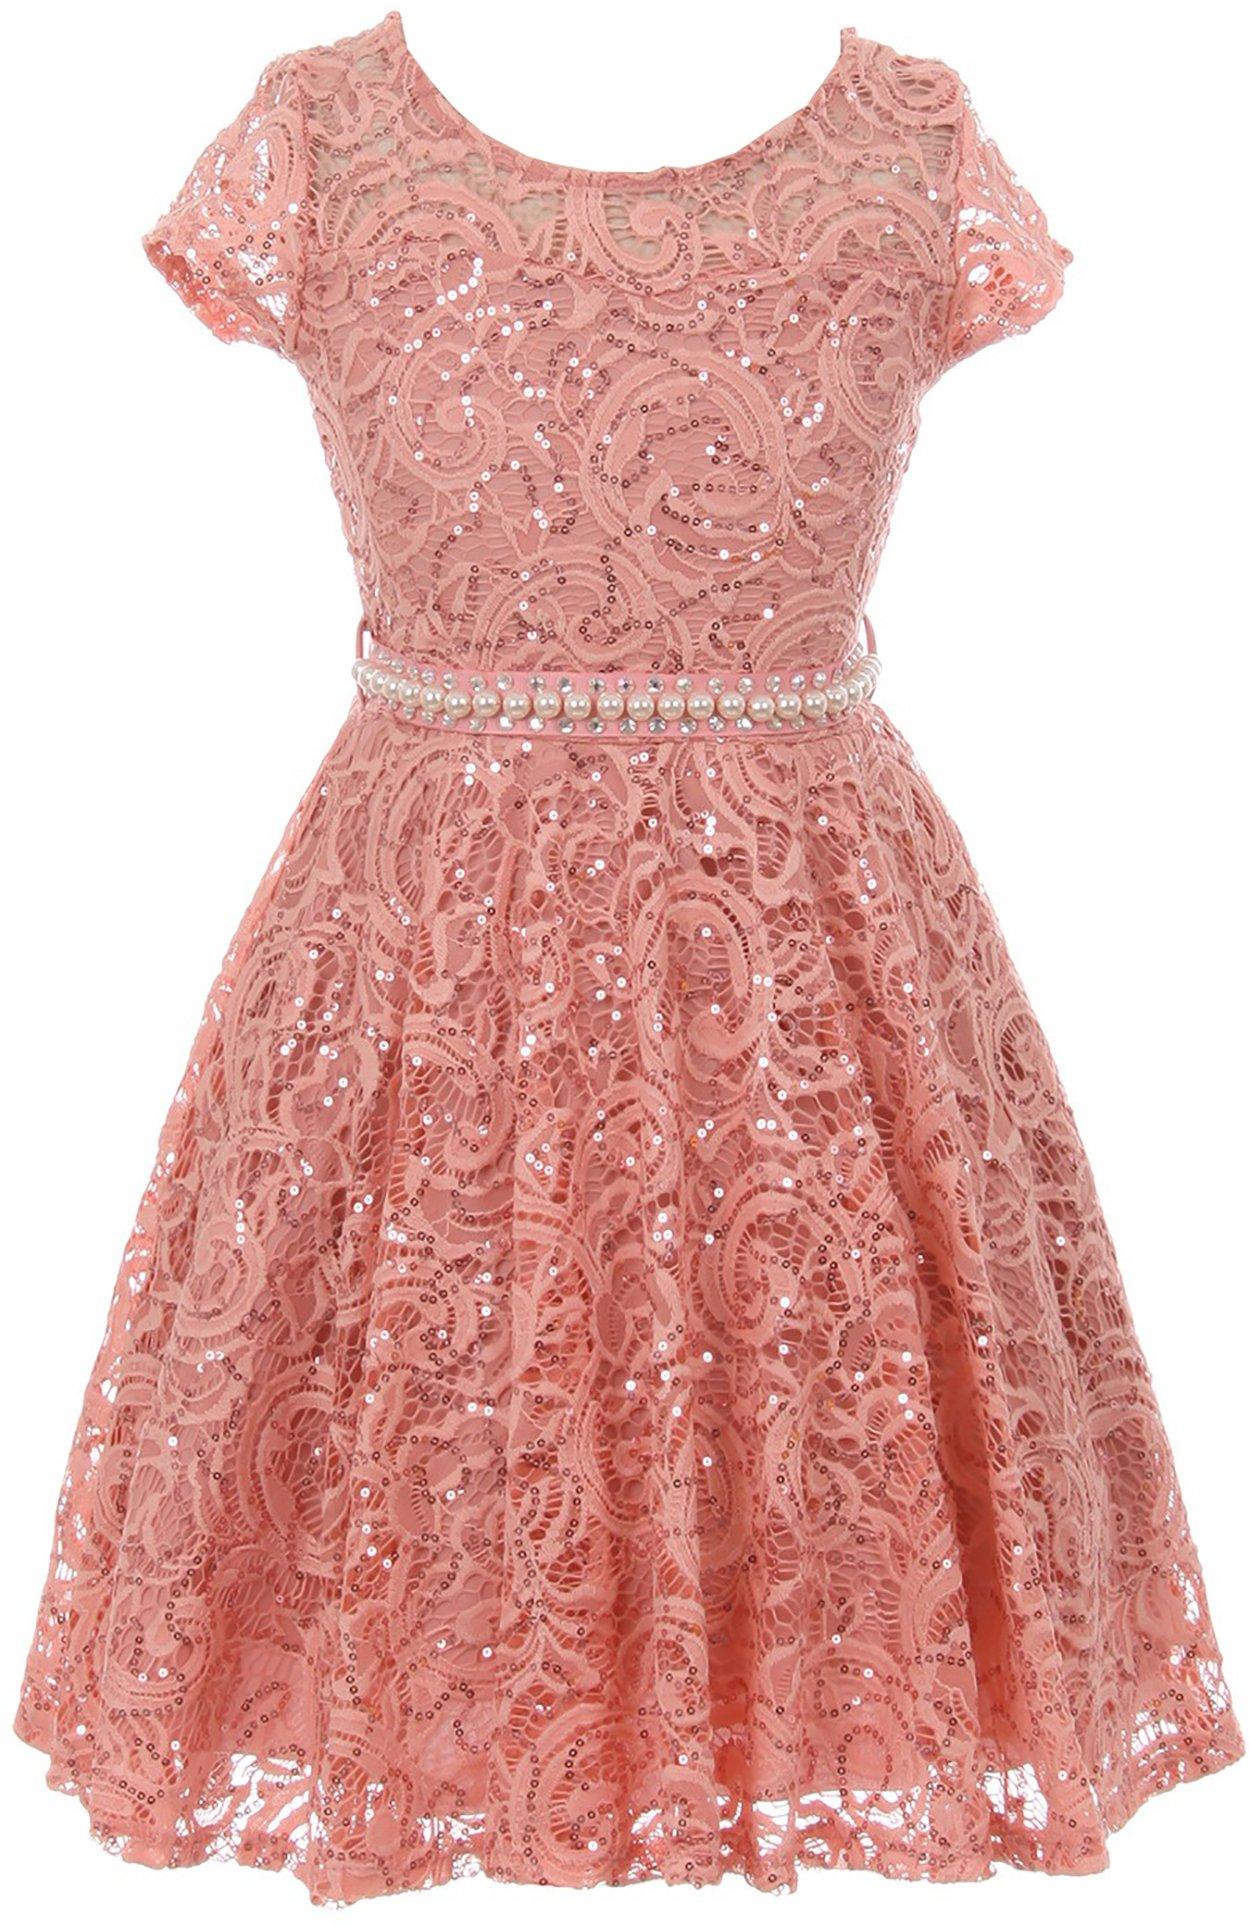 1c9623745d8 Galleon - Flower Girl Dress Cap Sleeve Sequin Skater Lace Dress Pearl Belt  For Big Girl Rose 10 JKS2102